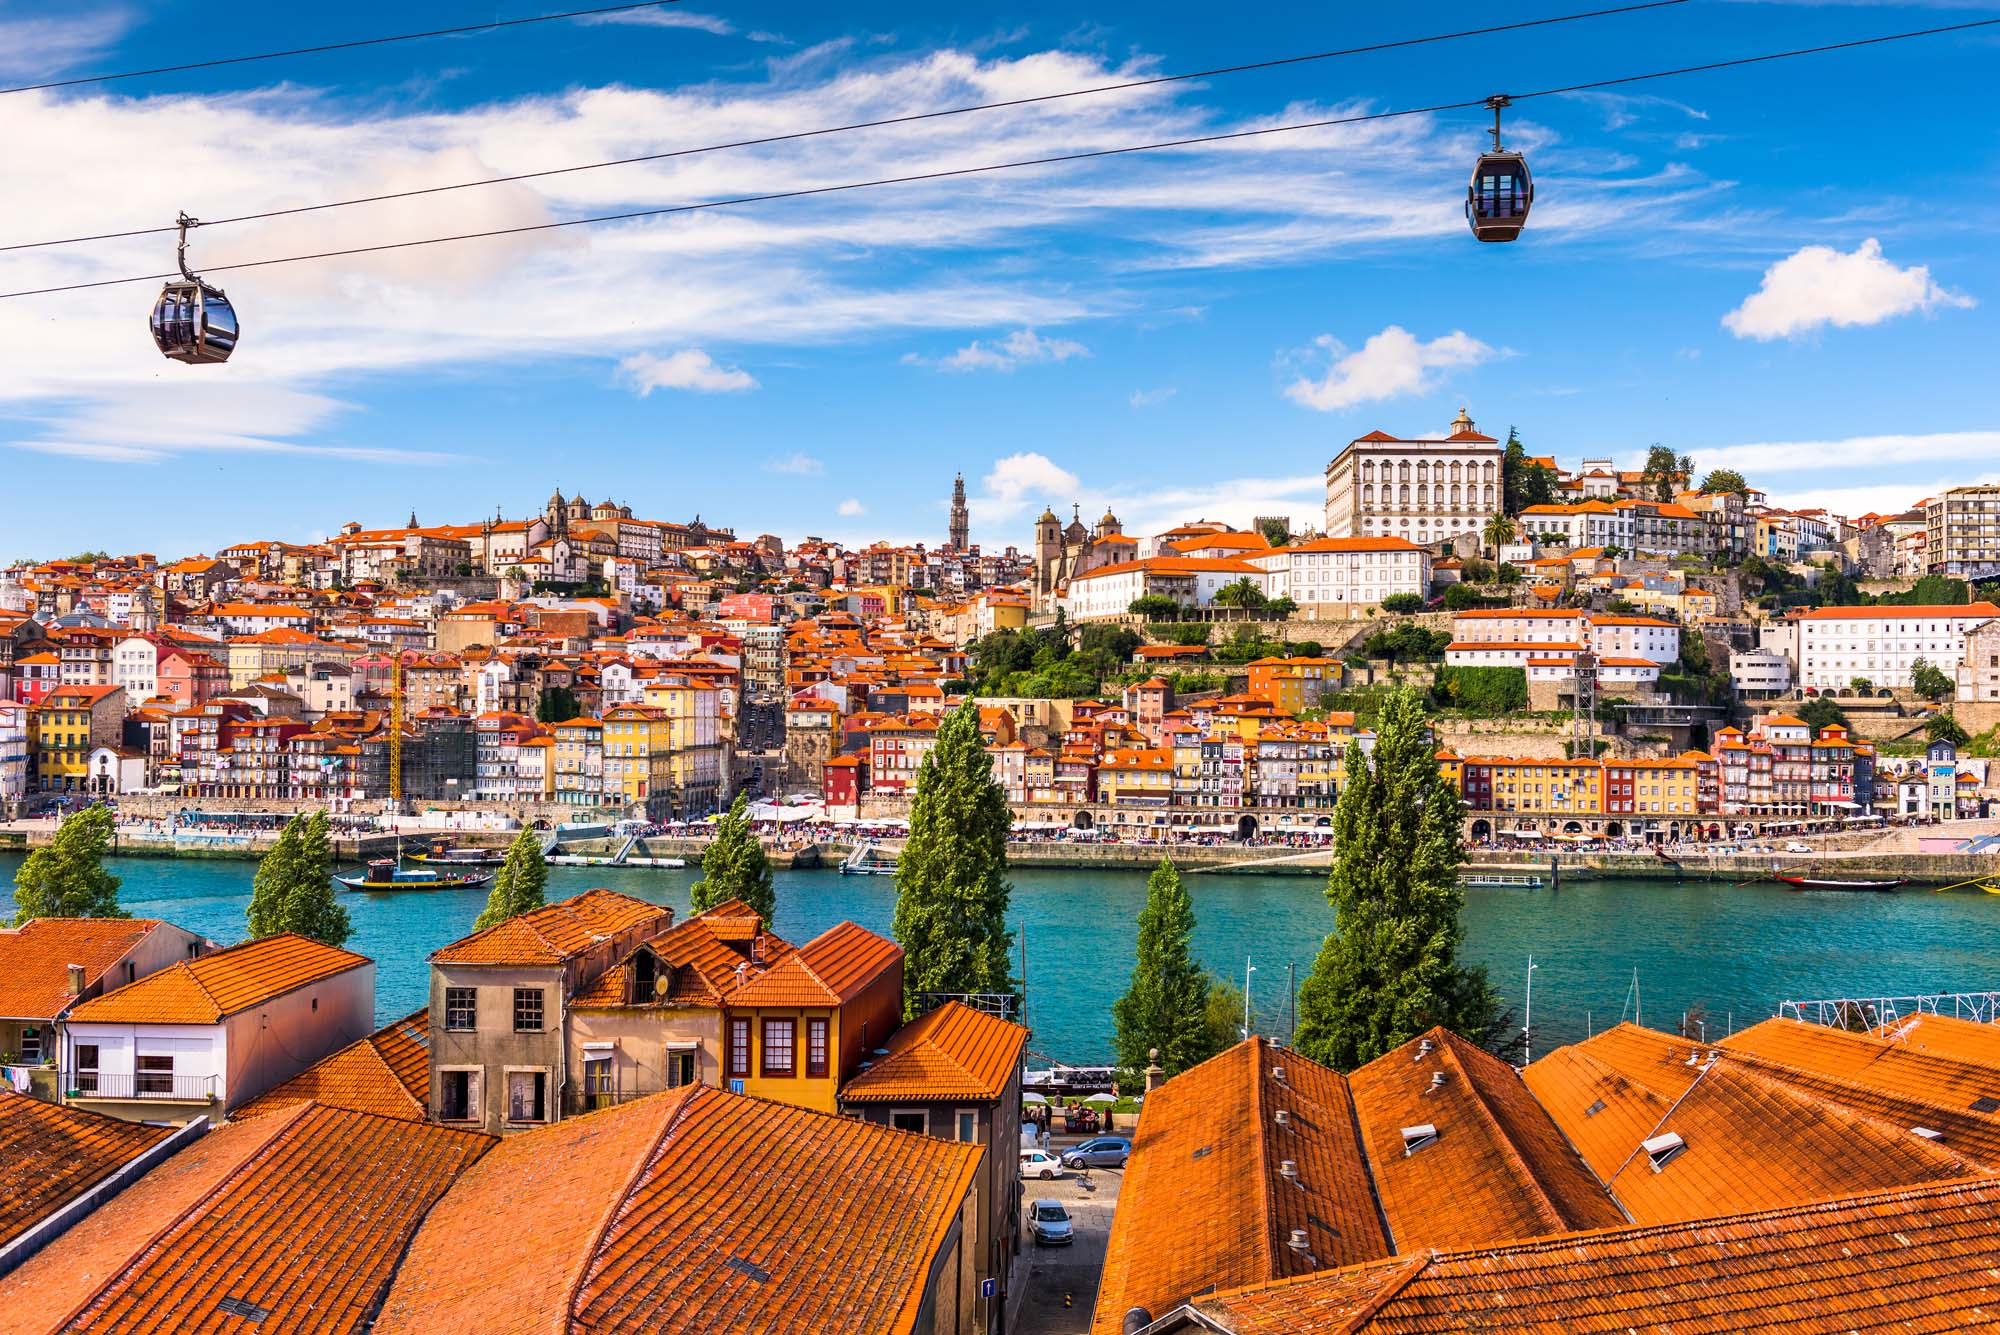 Porto, Portugal eid summer travel destination ideas